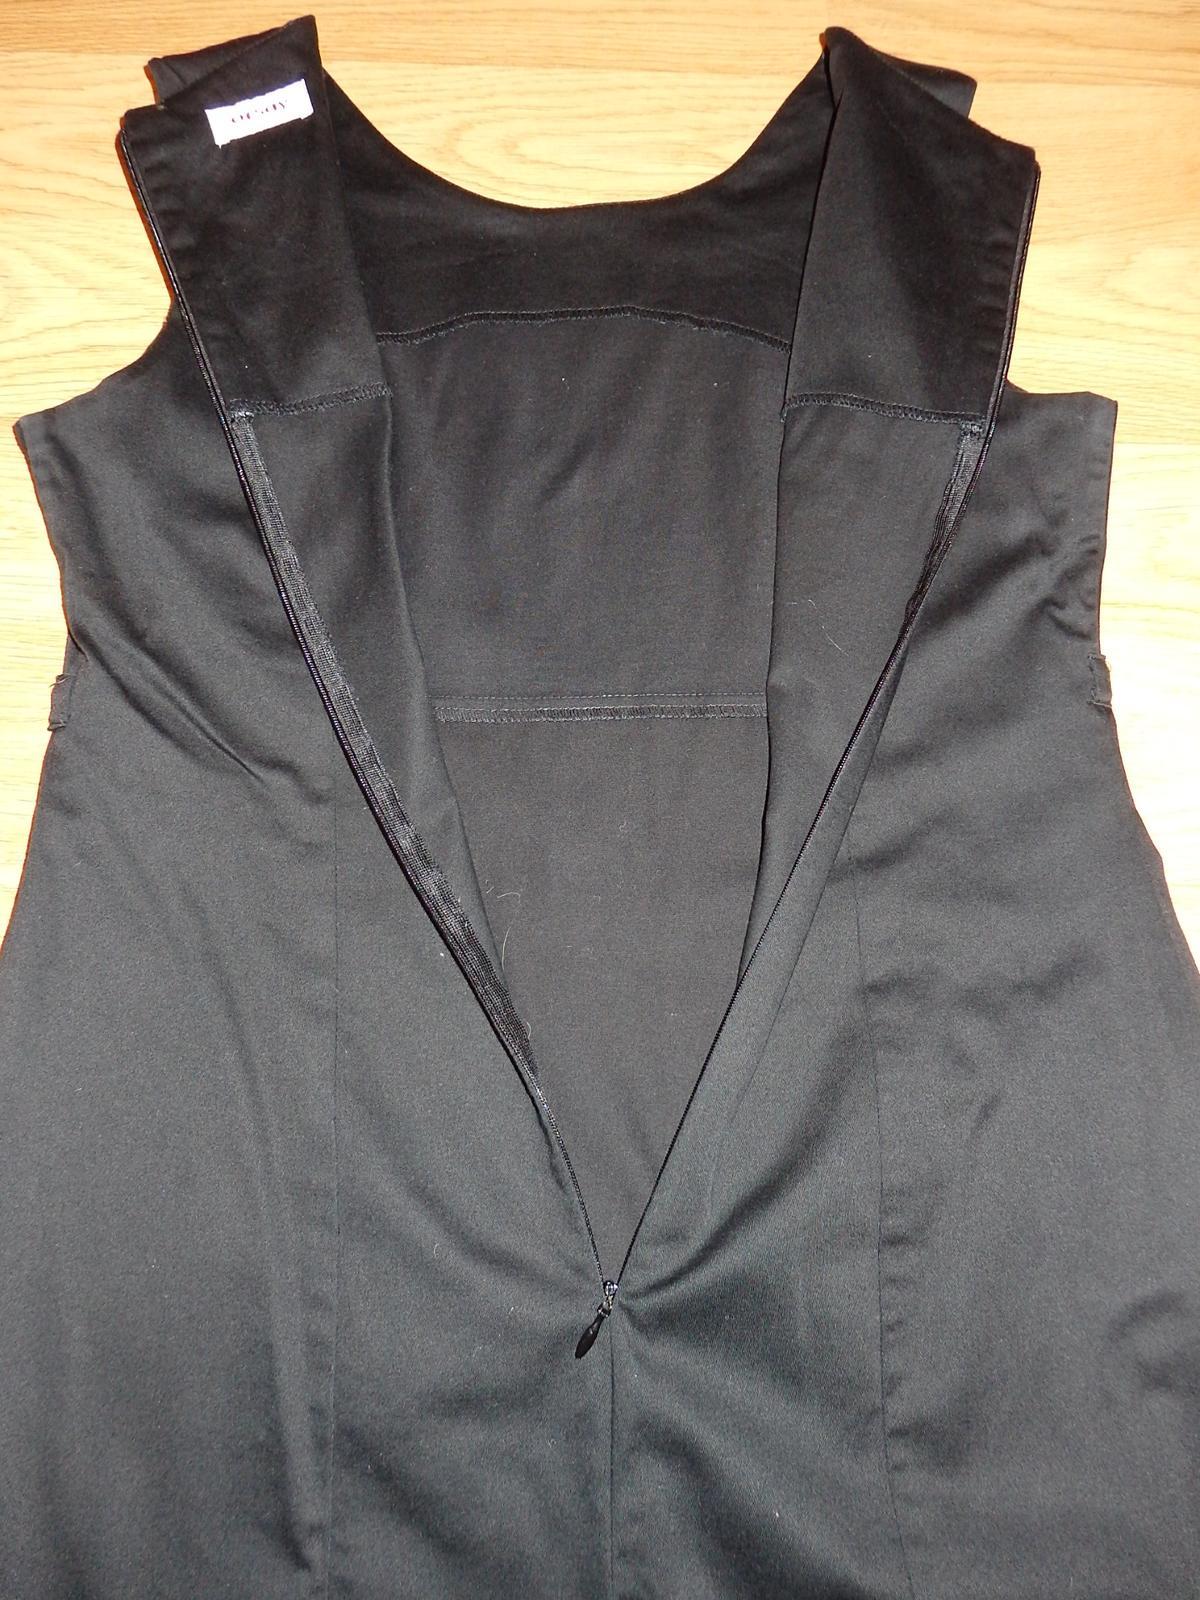 Puzdrové business šaty - Obrázok č. 3